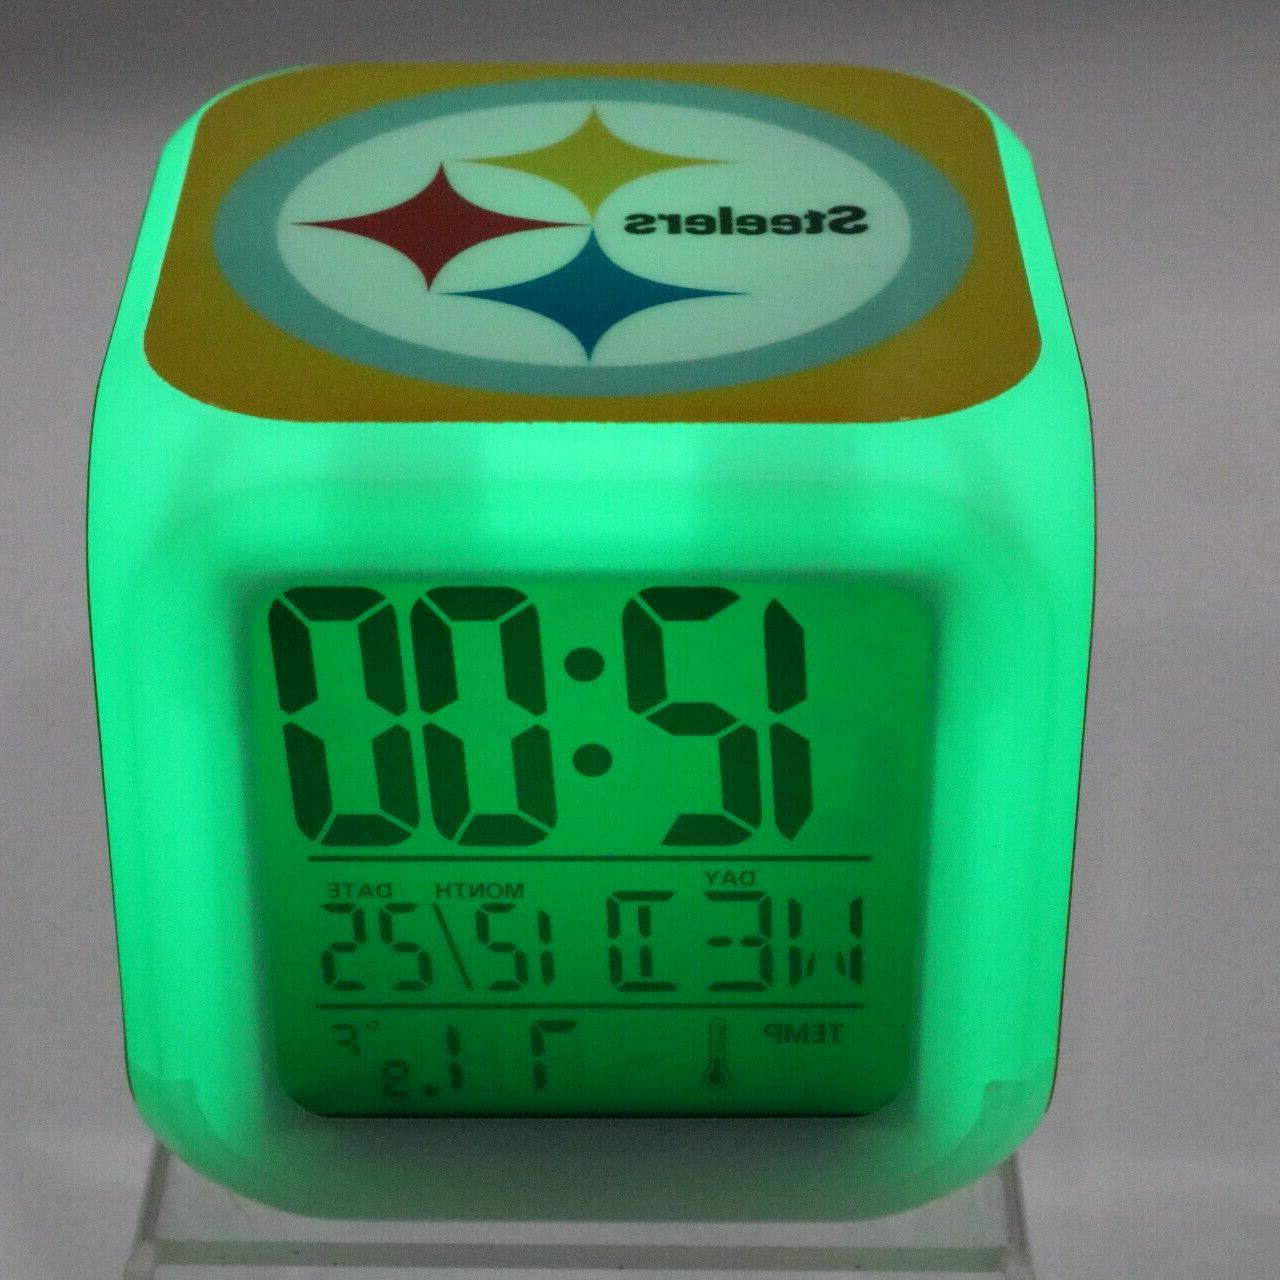 pittsburgh steelers led digital alarm clock watch